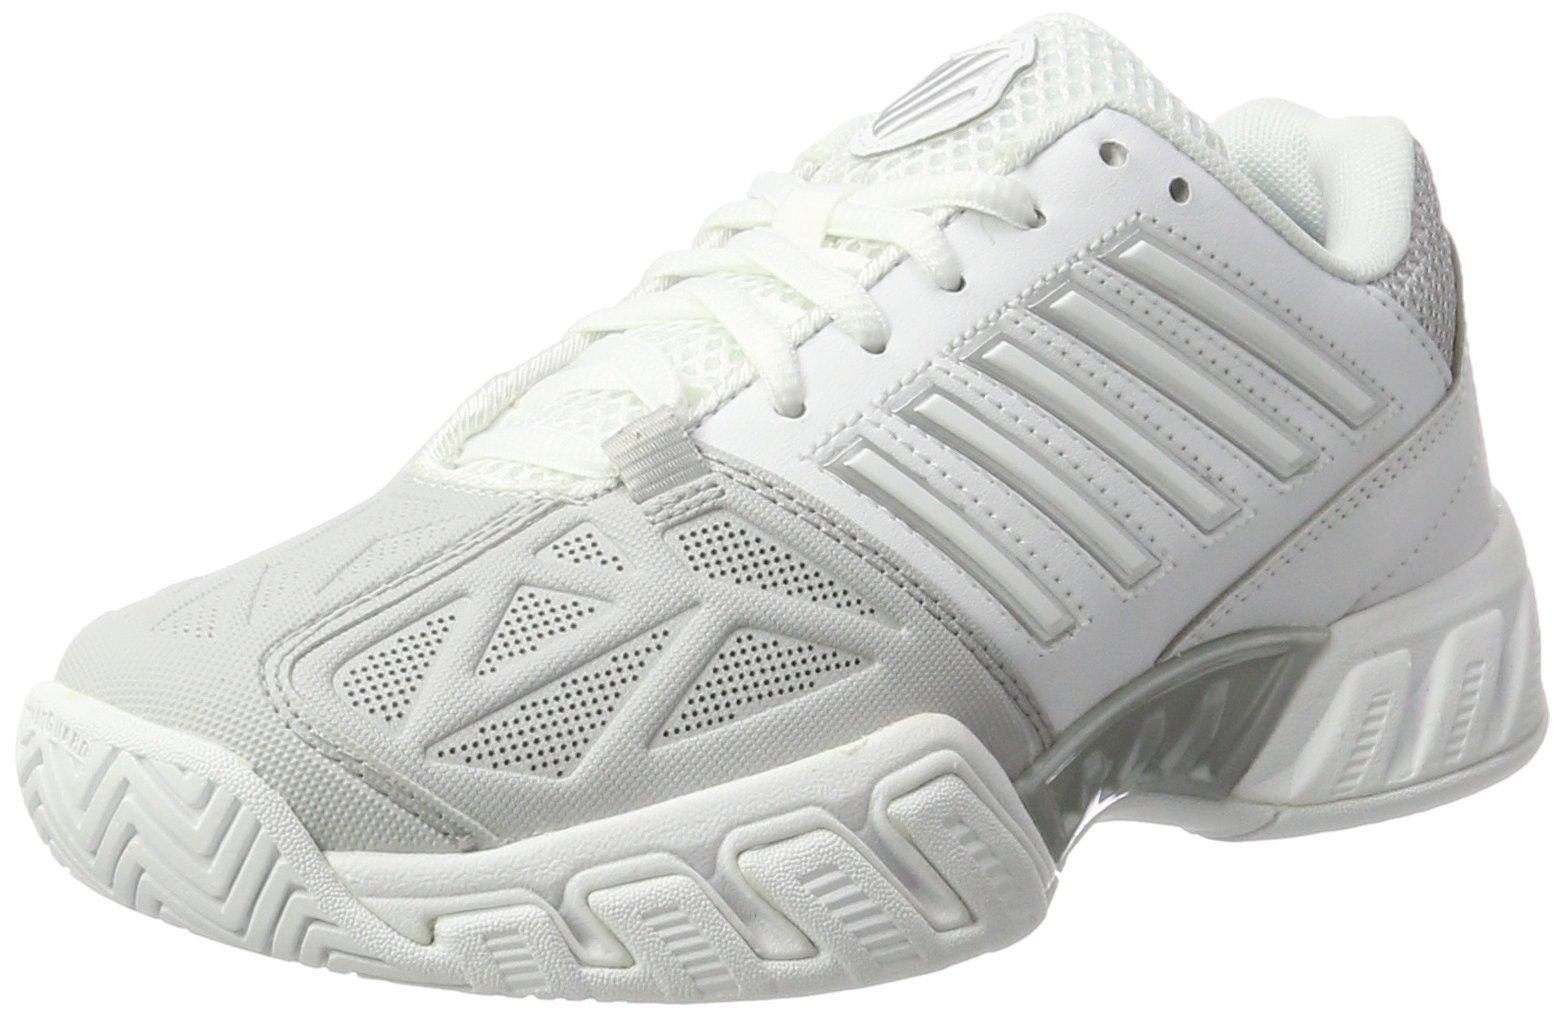 K-Swiss Women's Bigshot Light 3 Tennis Shoes (White/Silver) (10 B(M) US)